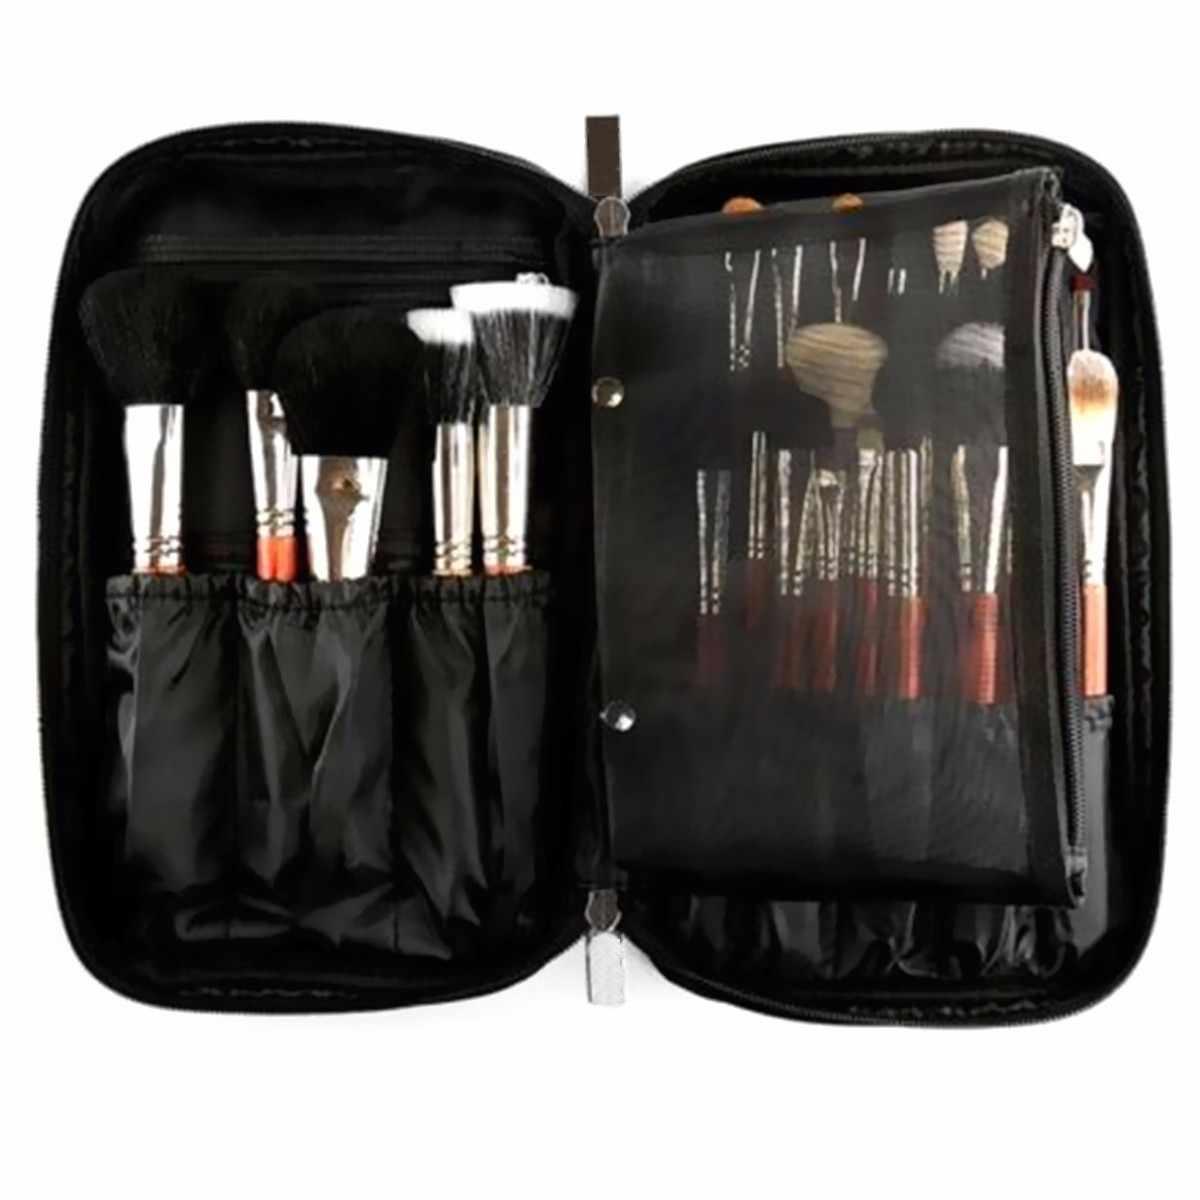 126f000165 1PCS Make Up Brush Organizer Travel Toiletry Handbag Cosmetic Storage Case  Beauty Tool Pouch Bag Women